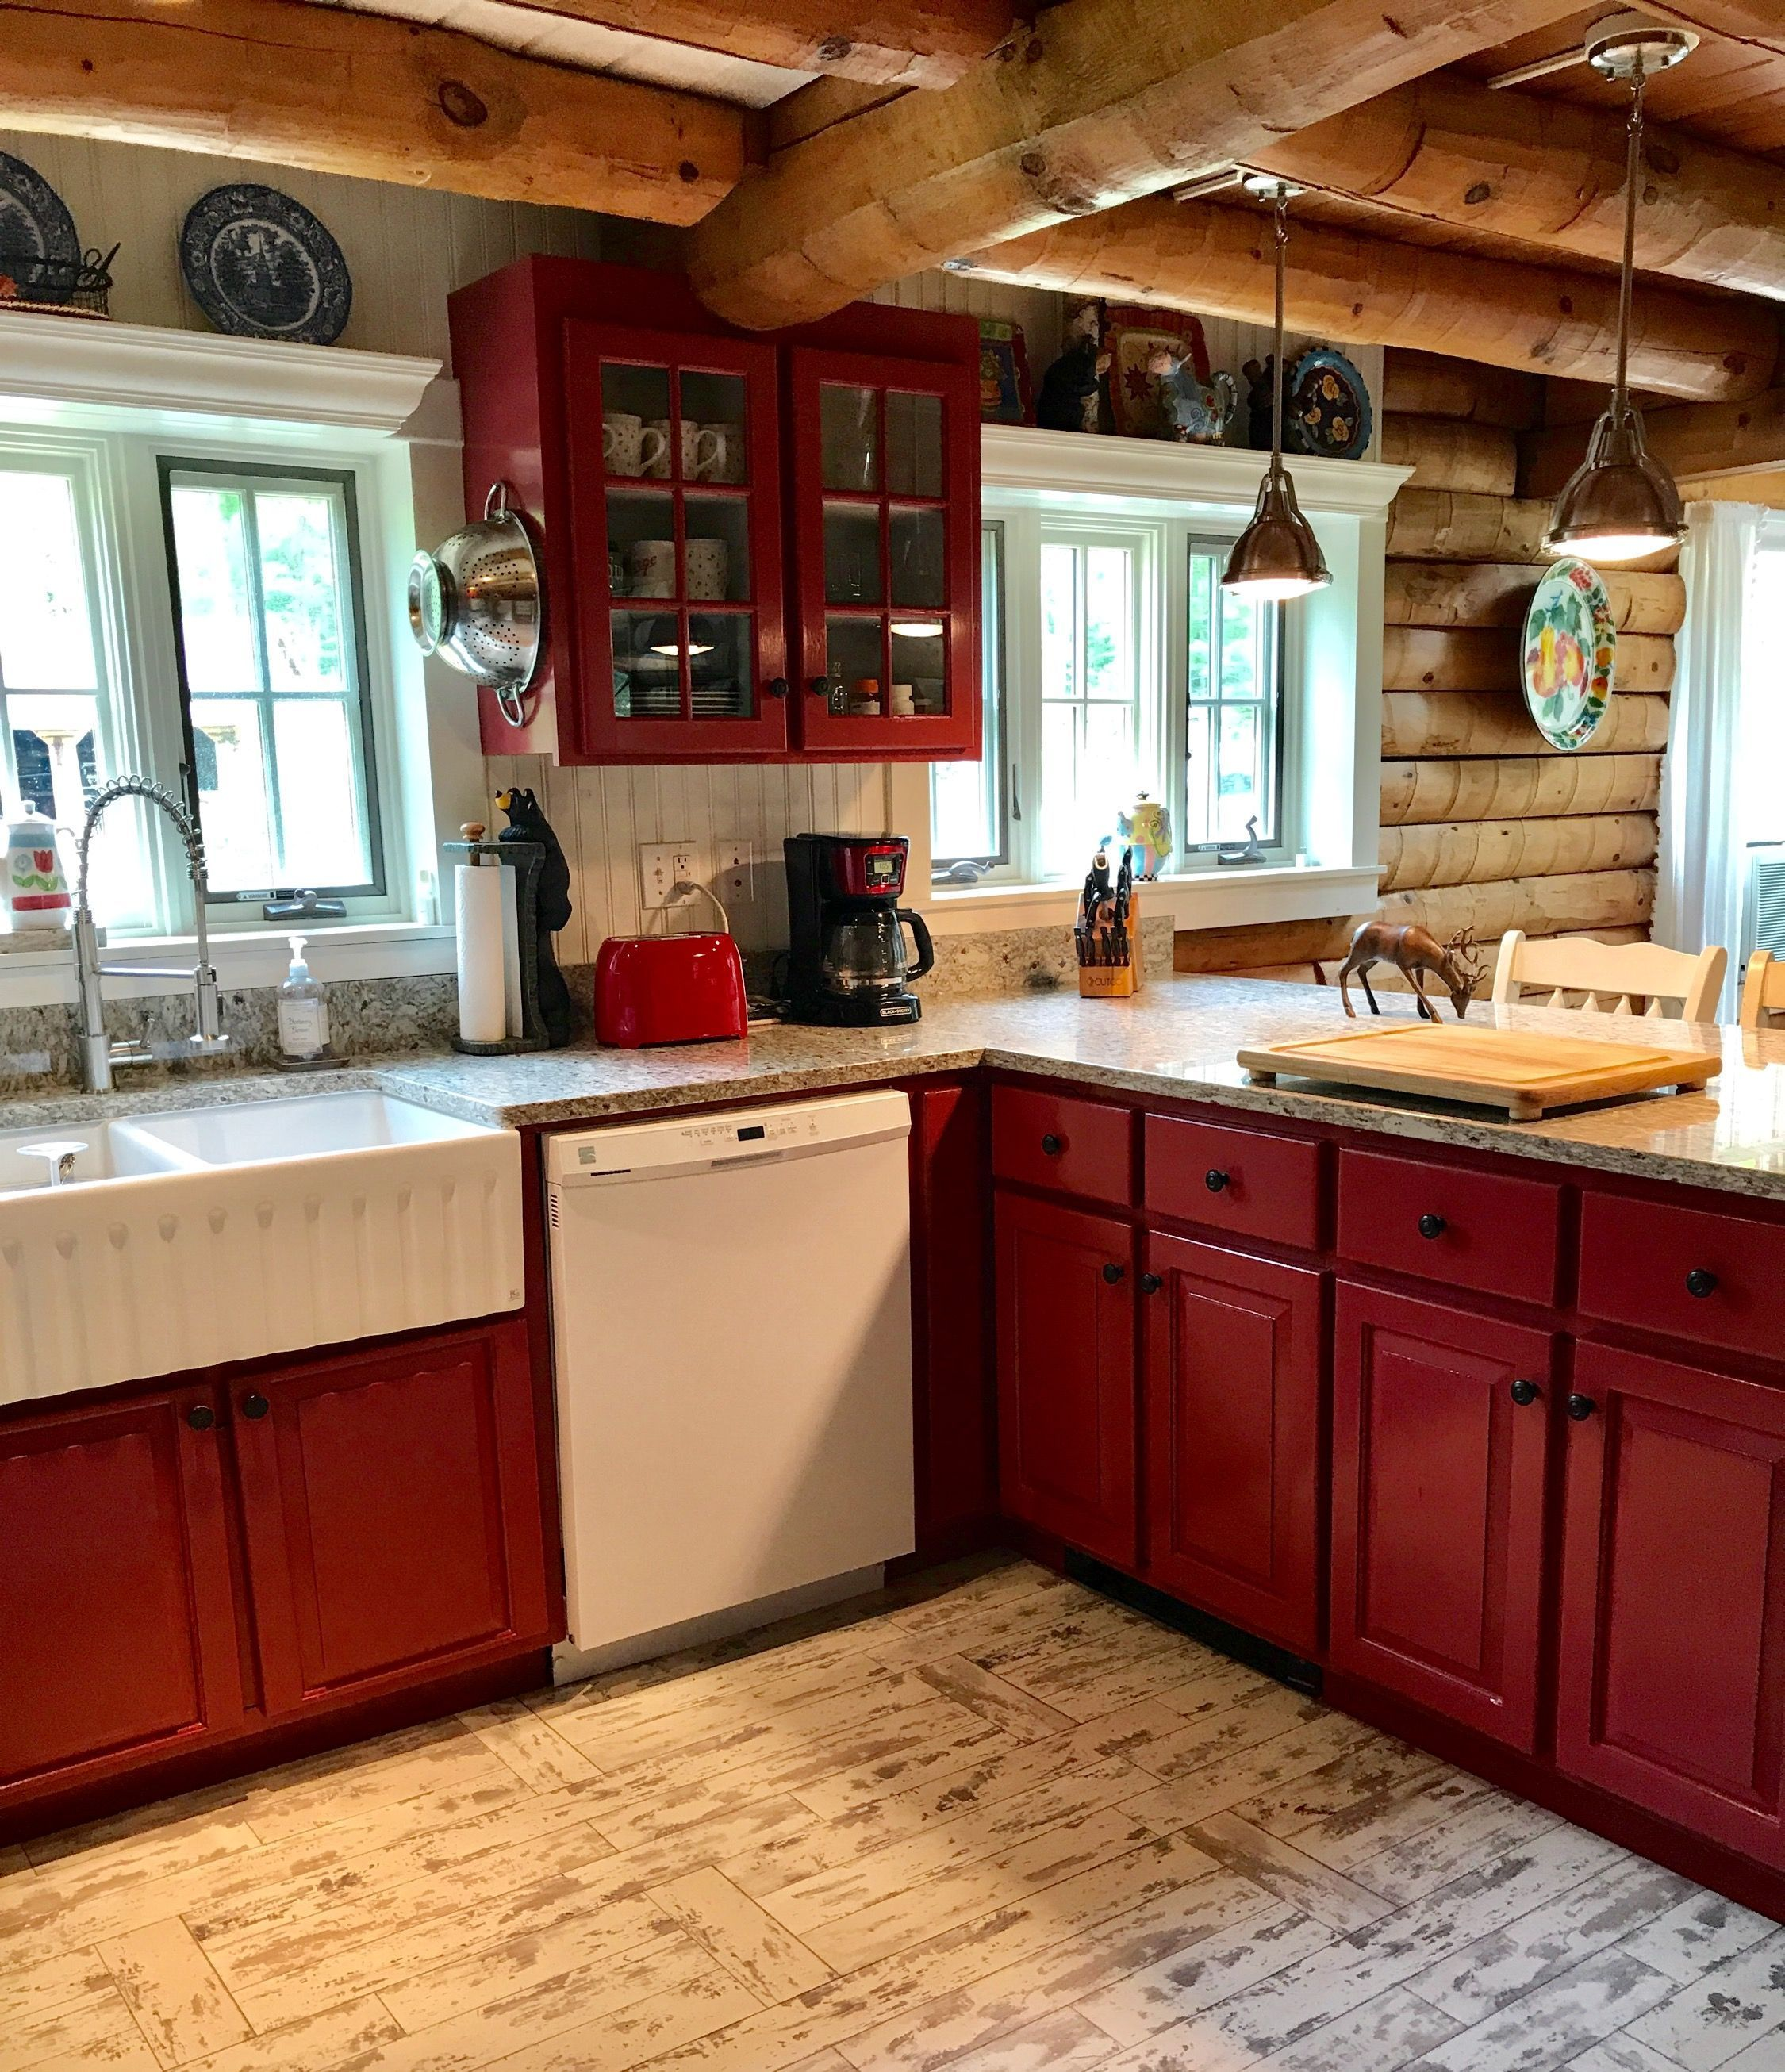 55 Simple Rural Farmhouse Barn Wood Kitchen Ideas Decoona Log Cabin Kitchens Cabin Kitchens Log Home Kitchens